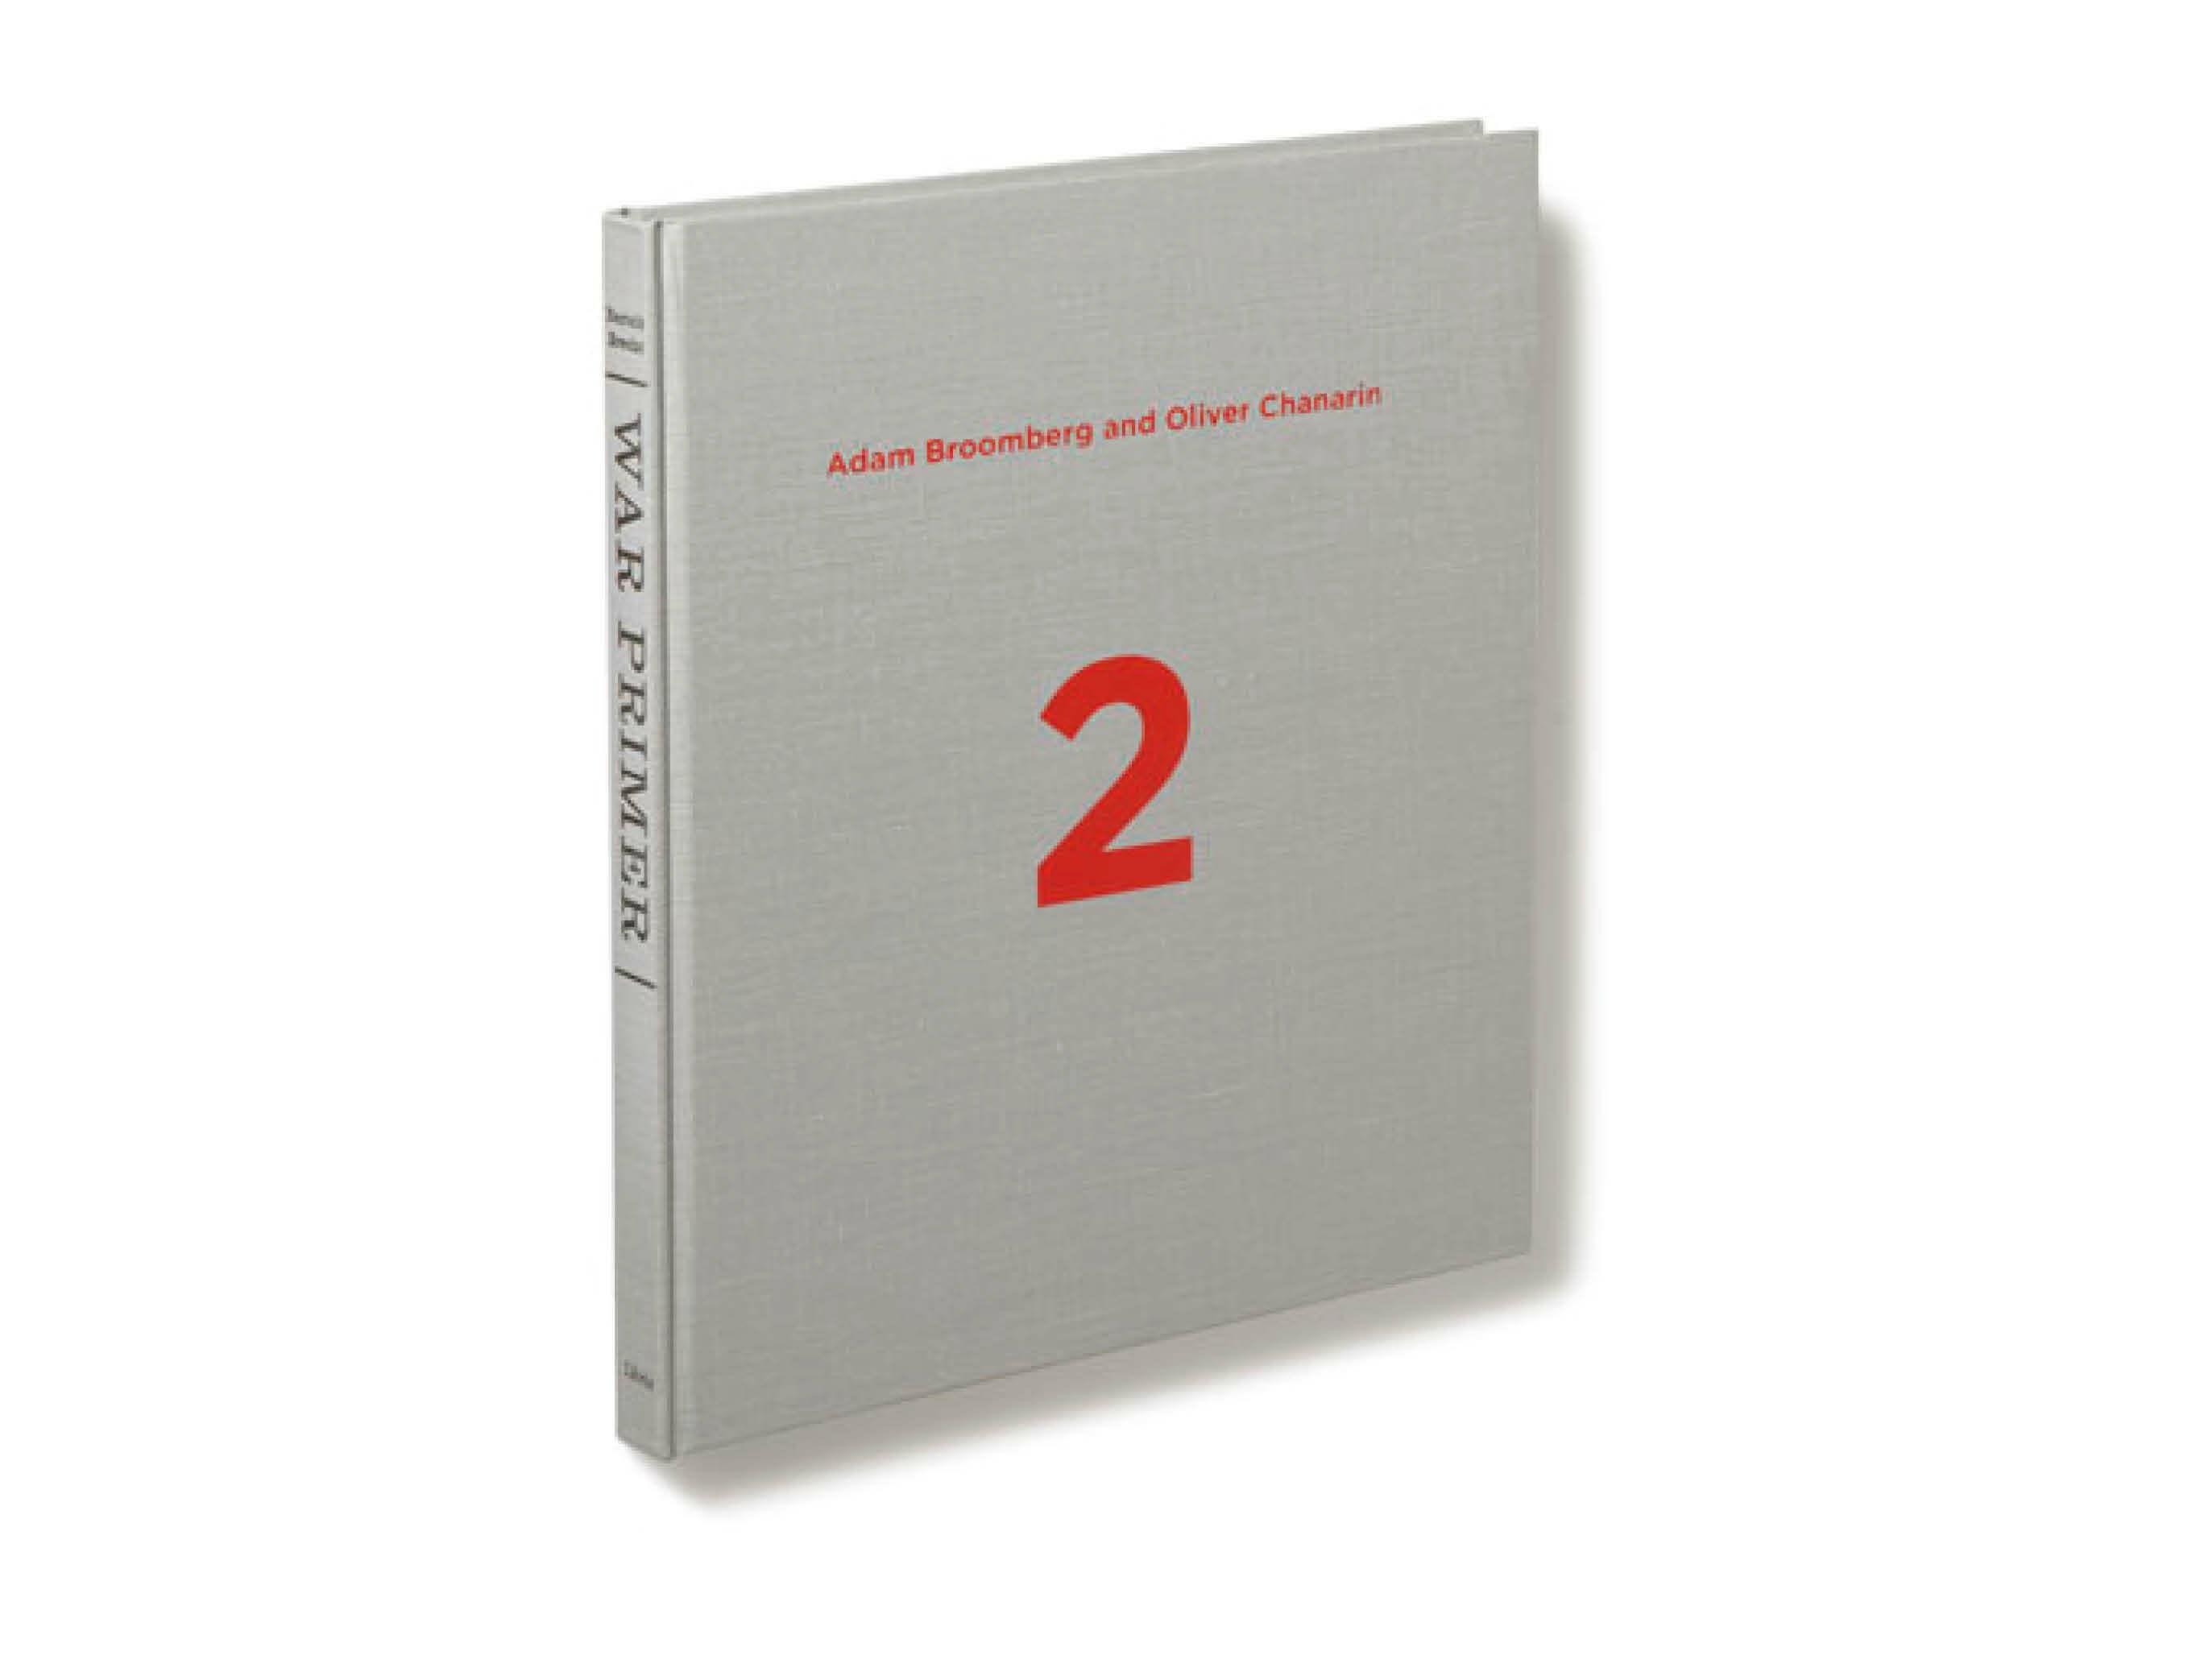 Broomberg & Chanarin receive the Arles 2018 Photo-Text Book Award